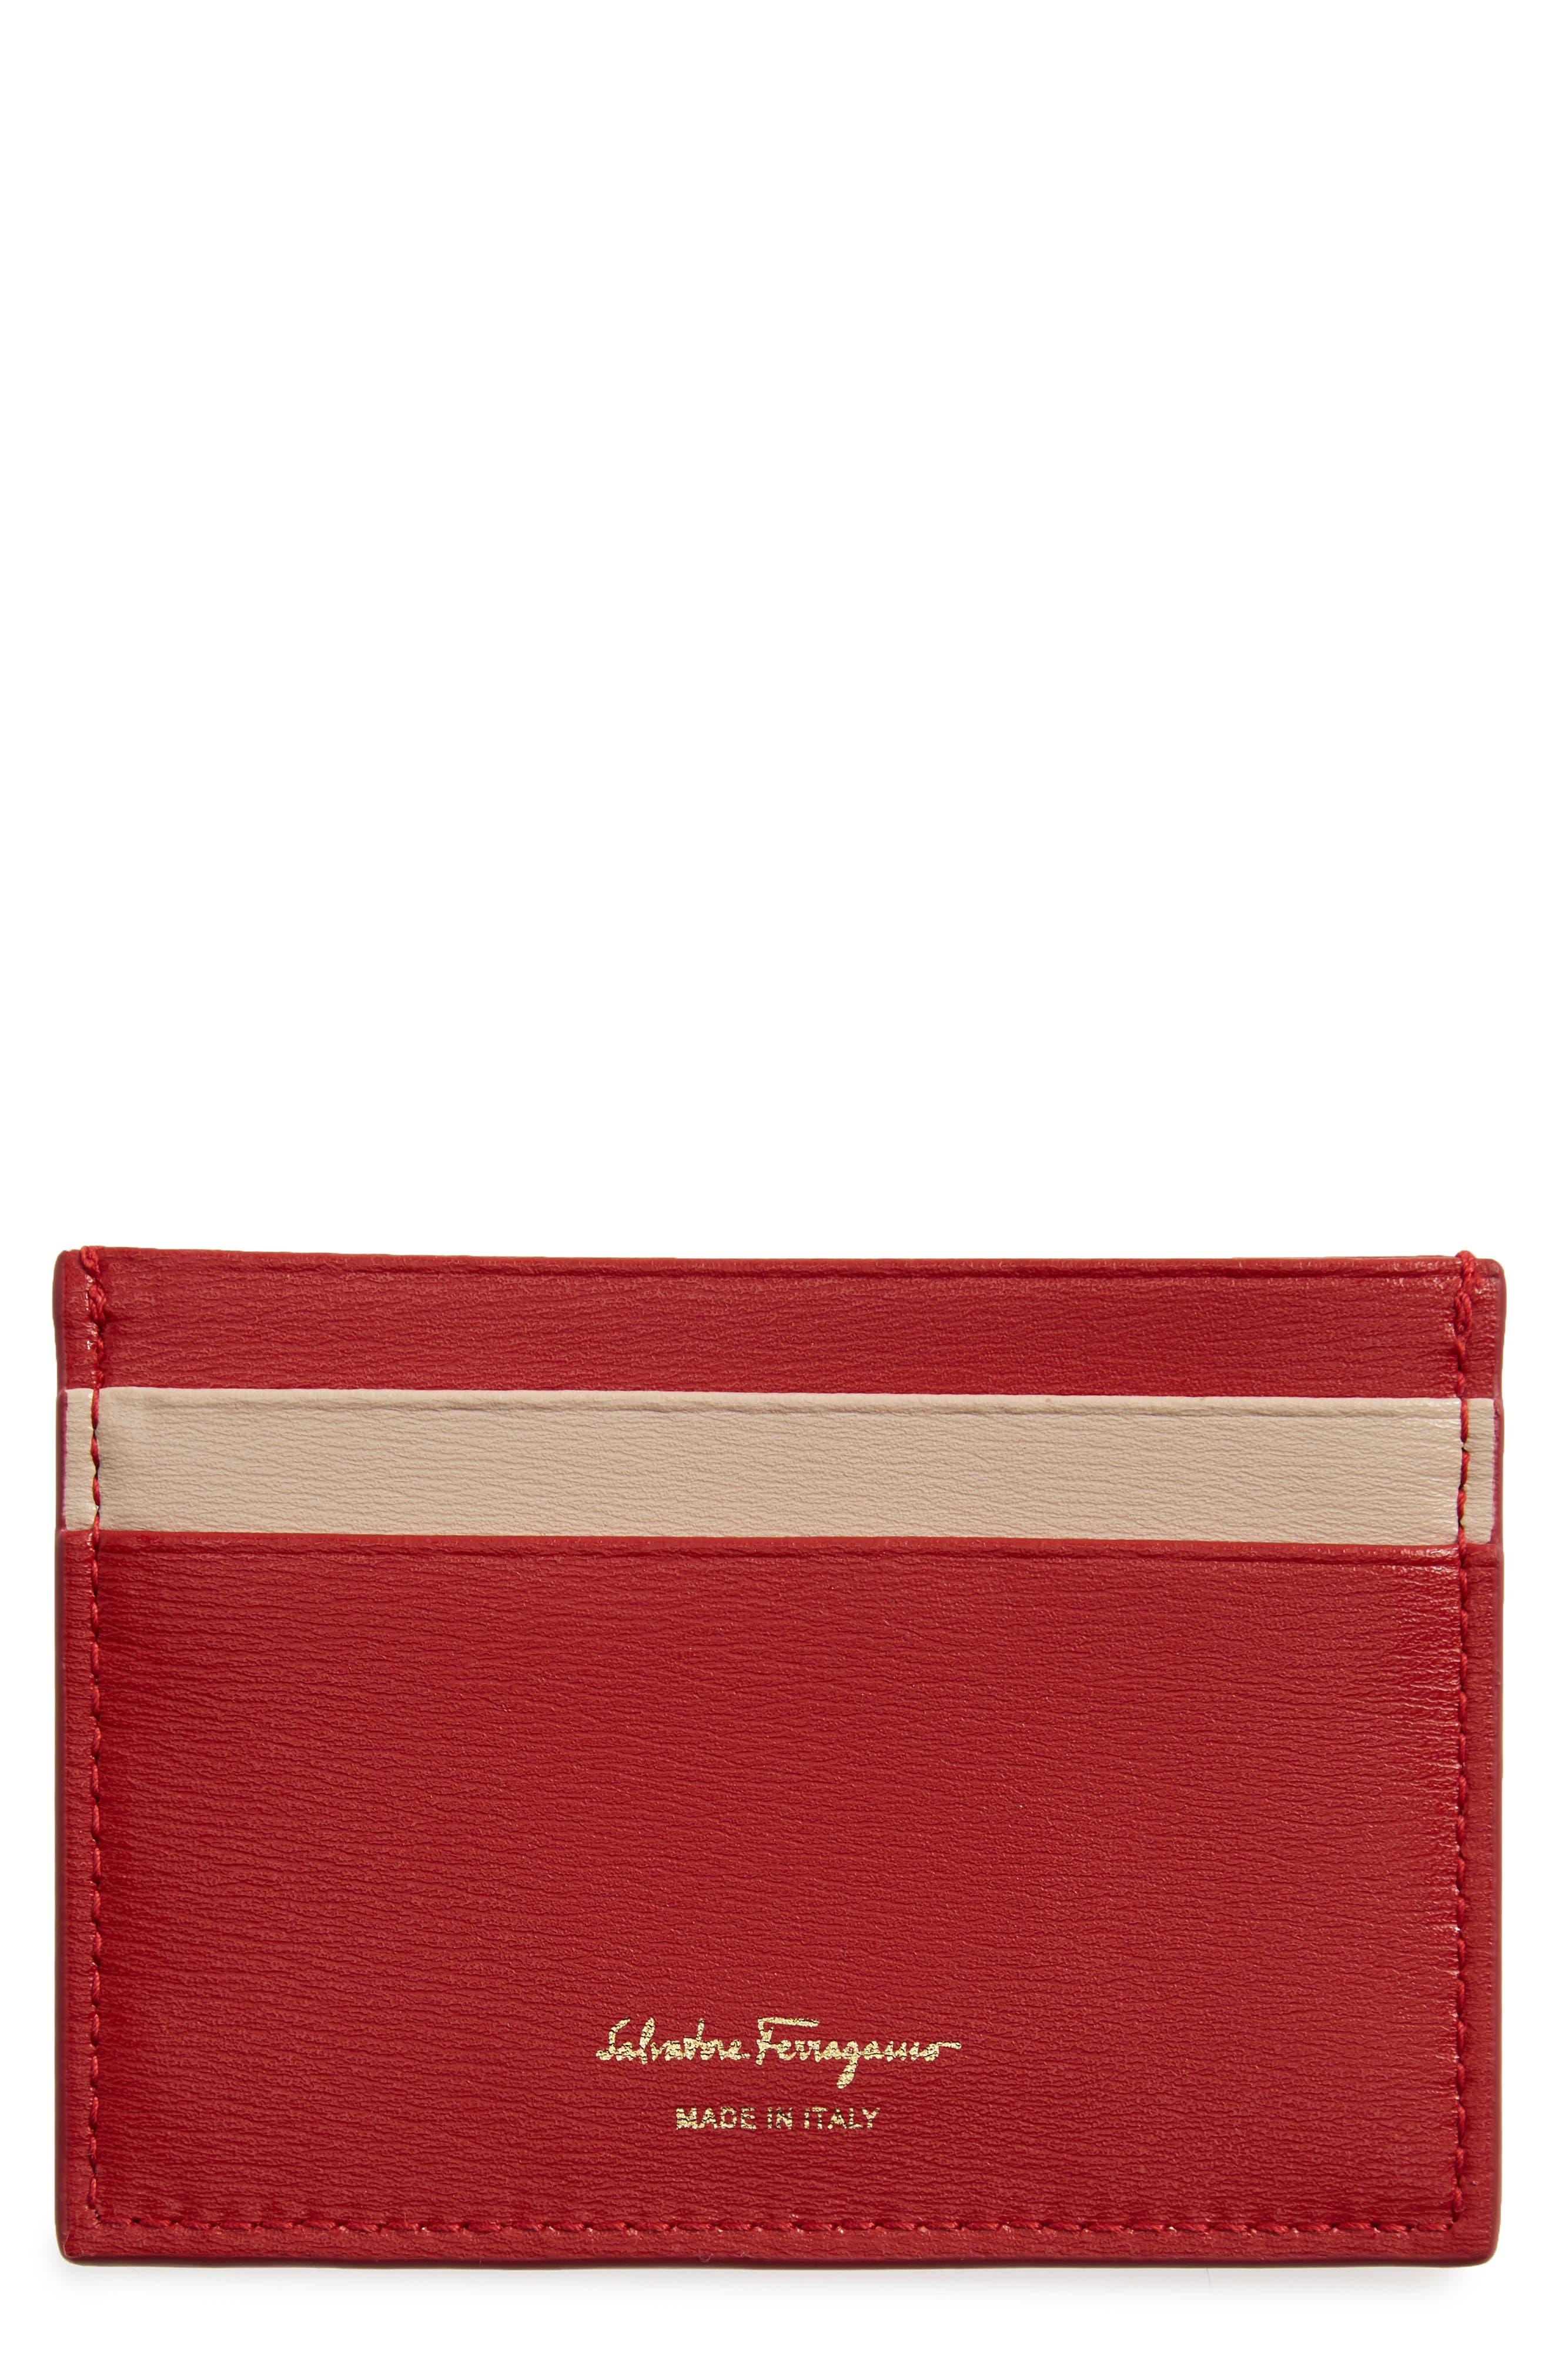 SALVATORE FERRAGAMO City Quilted Gancio Leather Card Case, Main, color, LIPSTICK